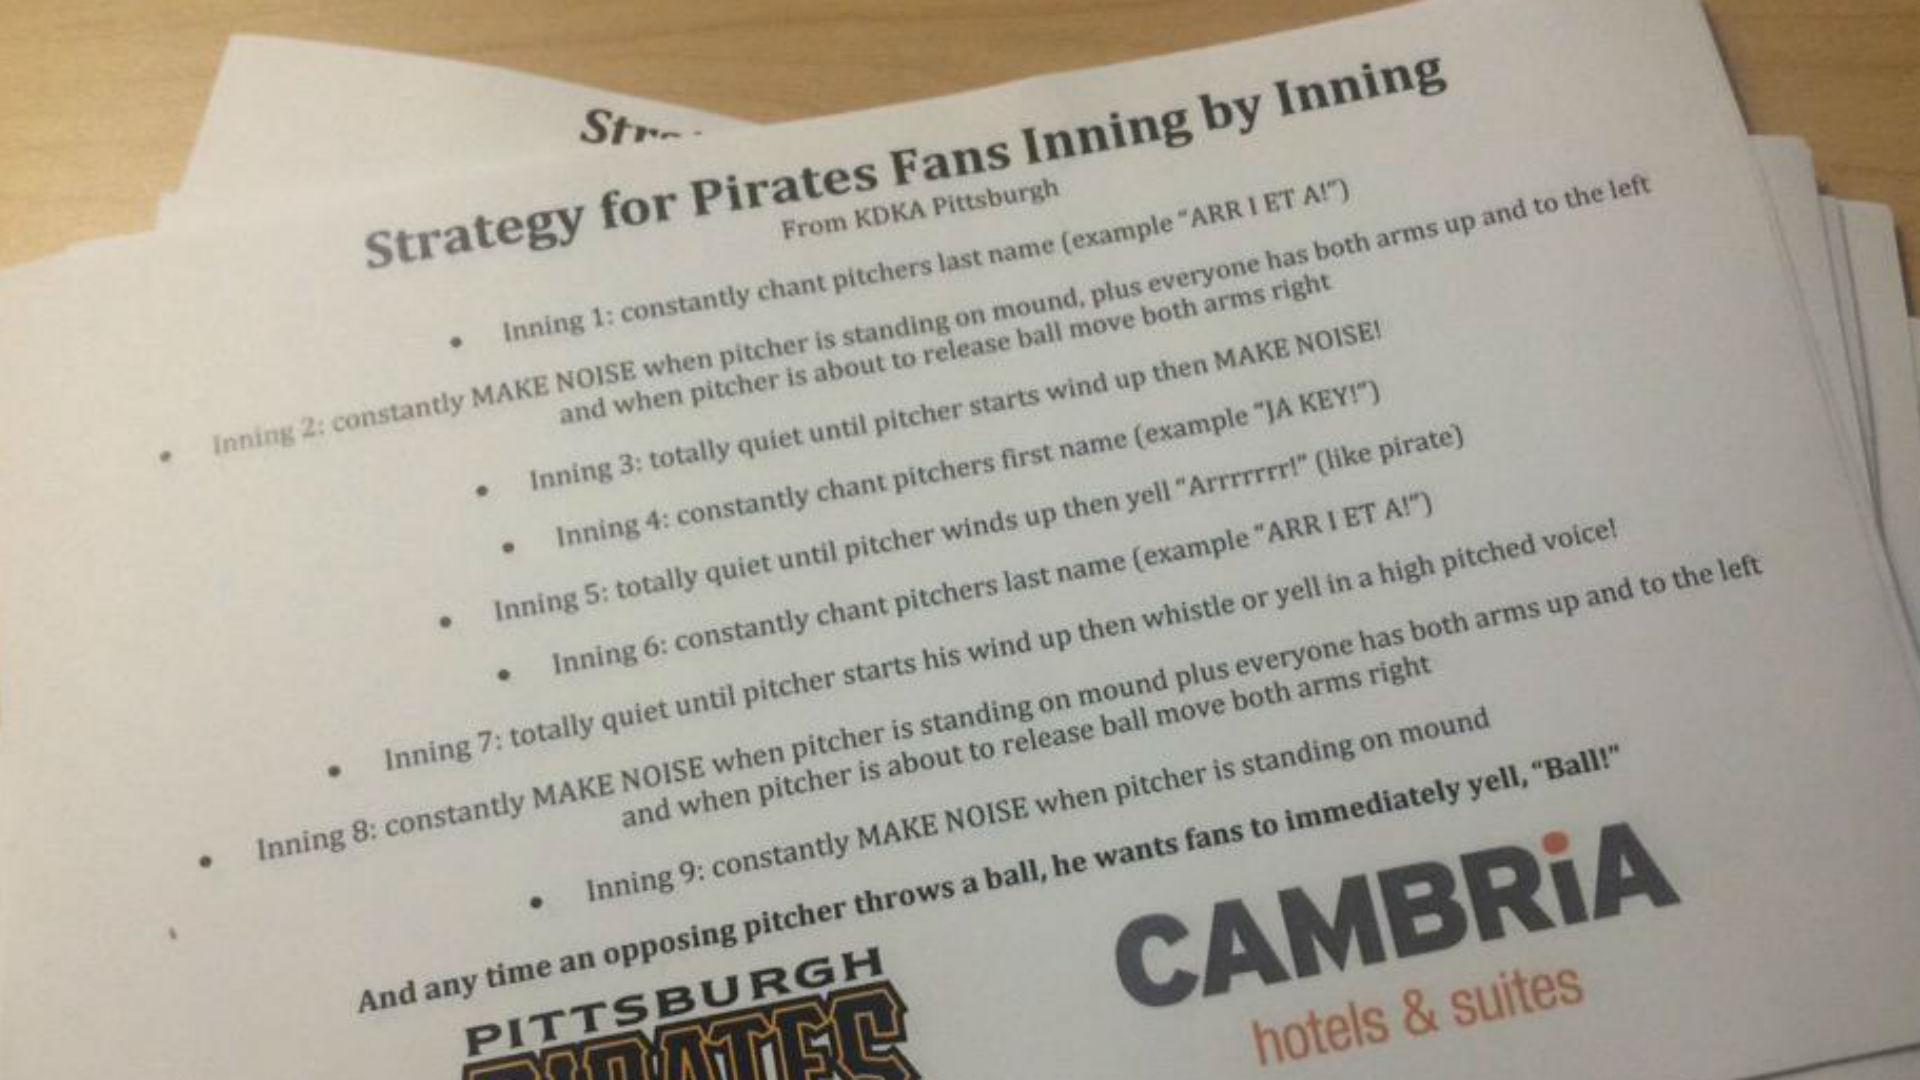 pirates-chants-ftr-twitter.jpg